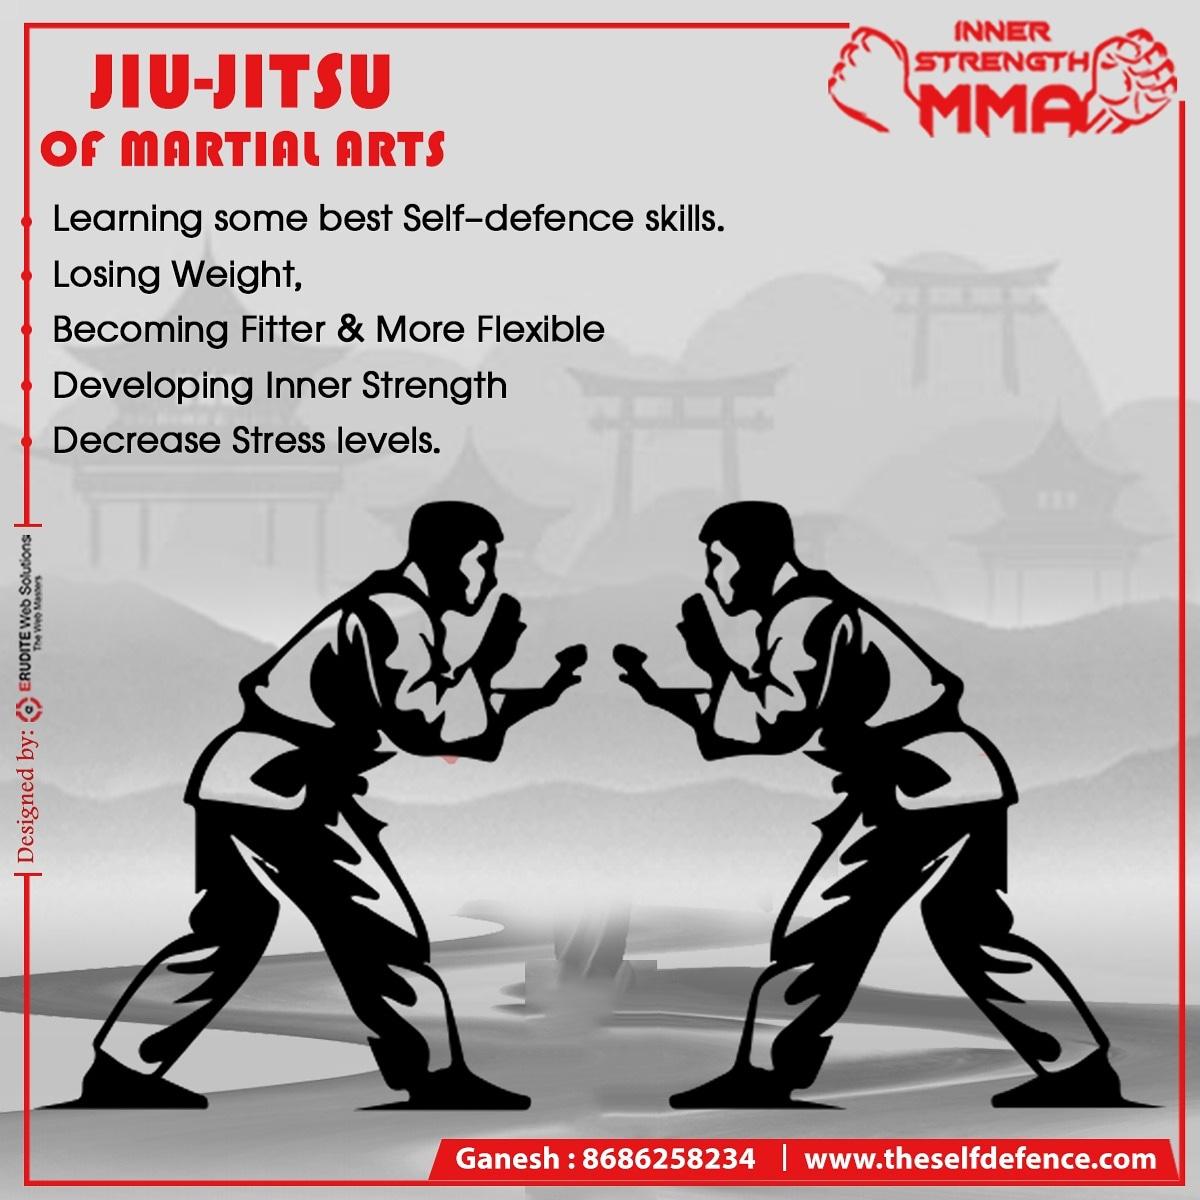 Develop internal strength and become Jfiyter and more flexible.join MMA to learn jiu-jitsu of martial arts.  . . . . . . . . . . . . . . .  #theselfdefence #HIIT #shaolinkungfu  #jiujitsu #kalari #kuttuvarisal #varmakalai  #kalarpayyattu #oldest #traditional #academy #culturepic.twitter.com/7iYOaH4QWs